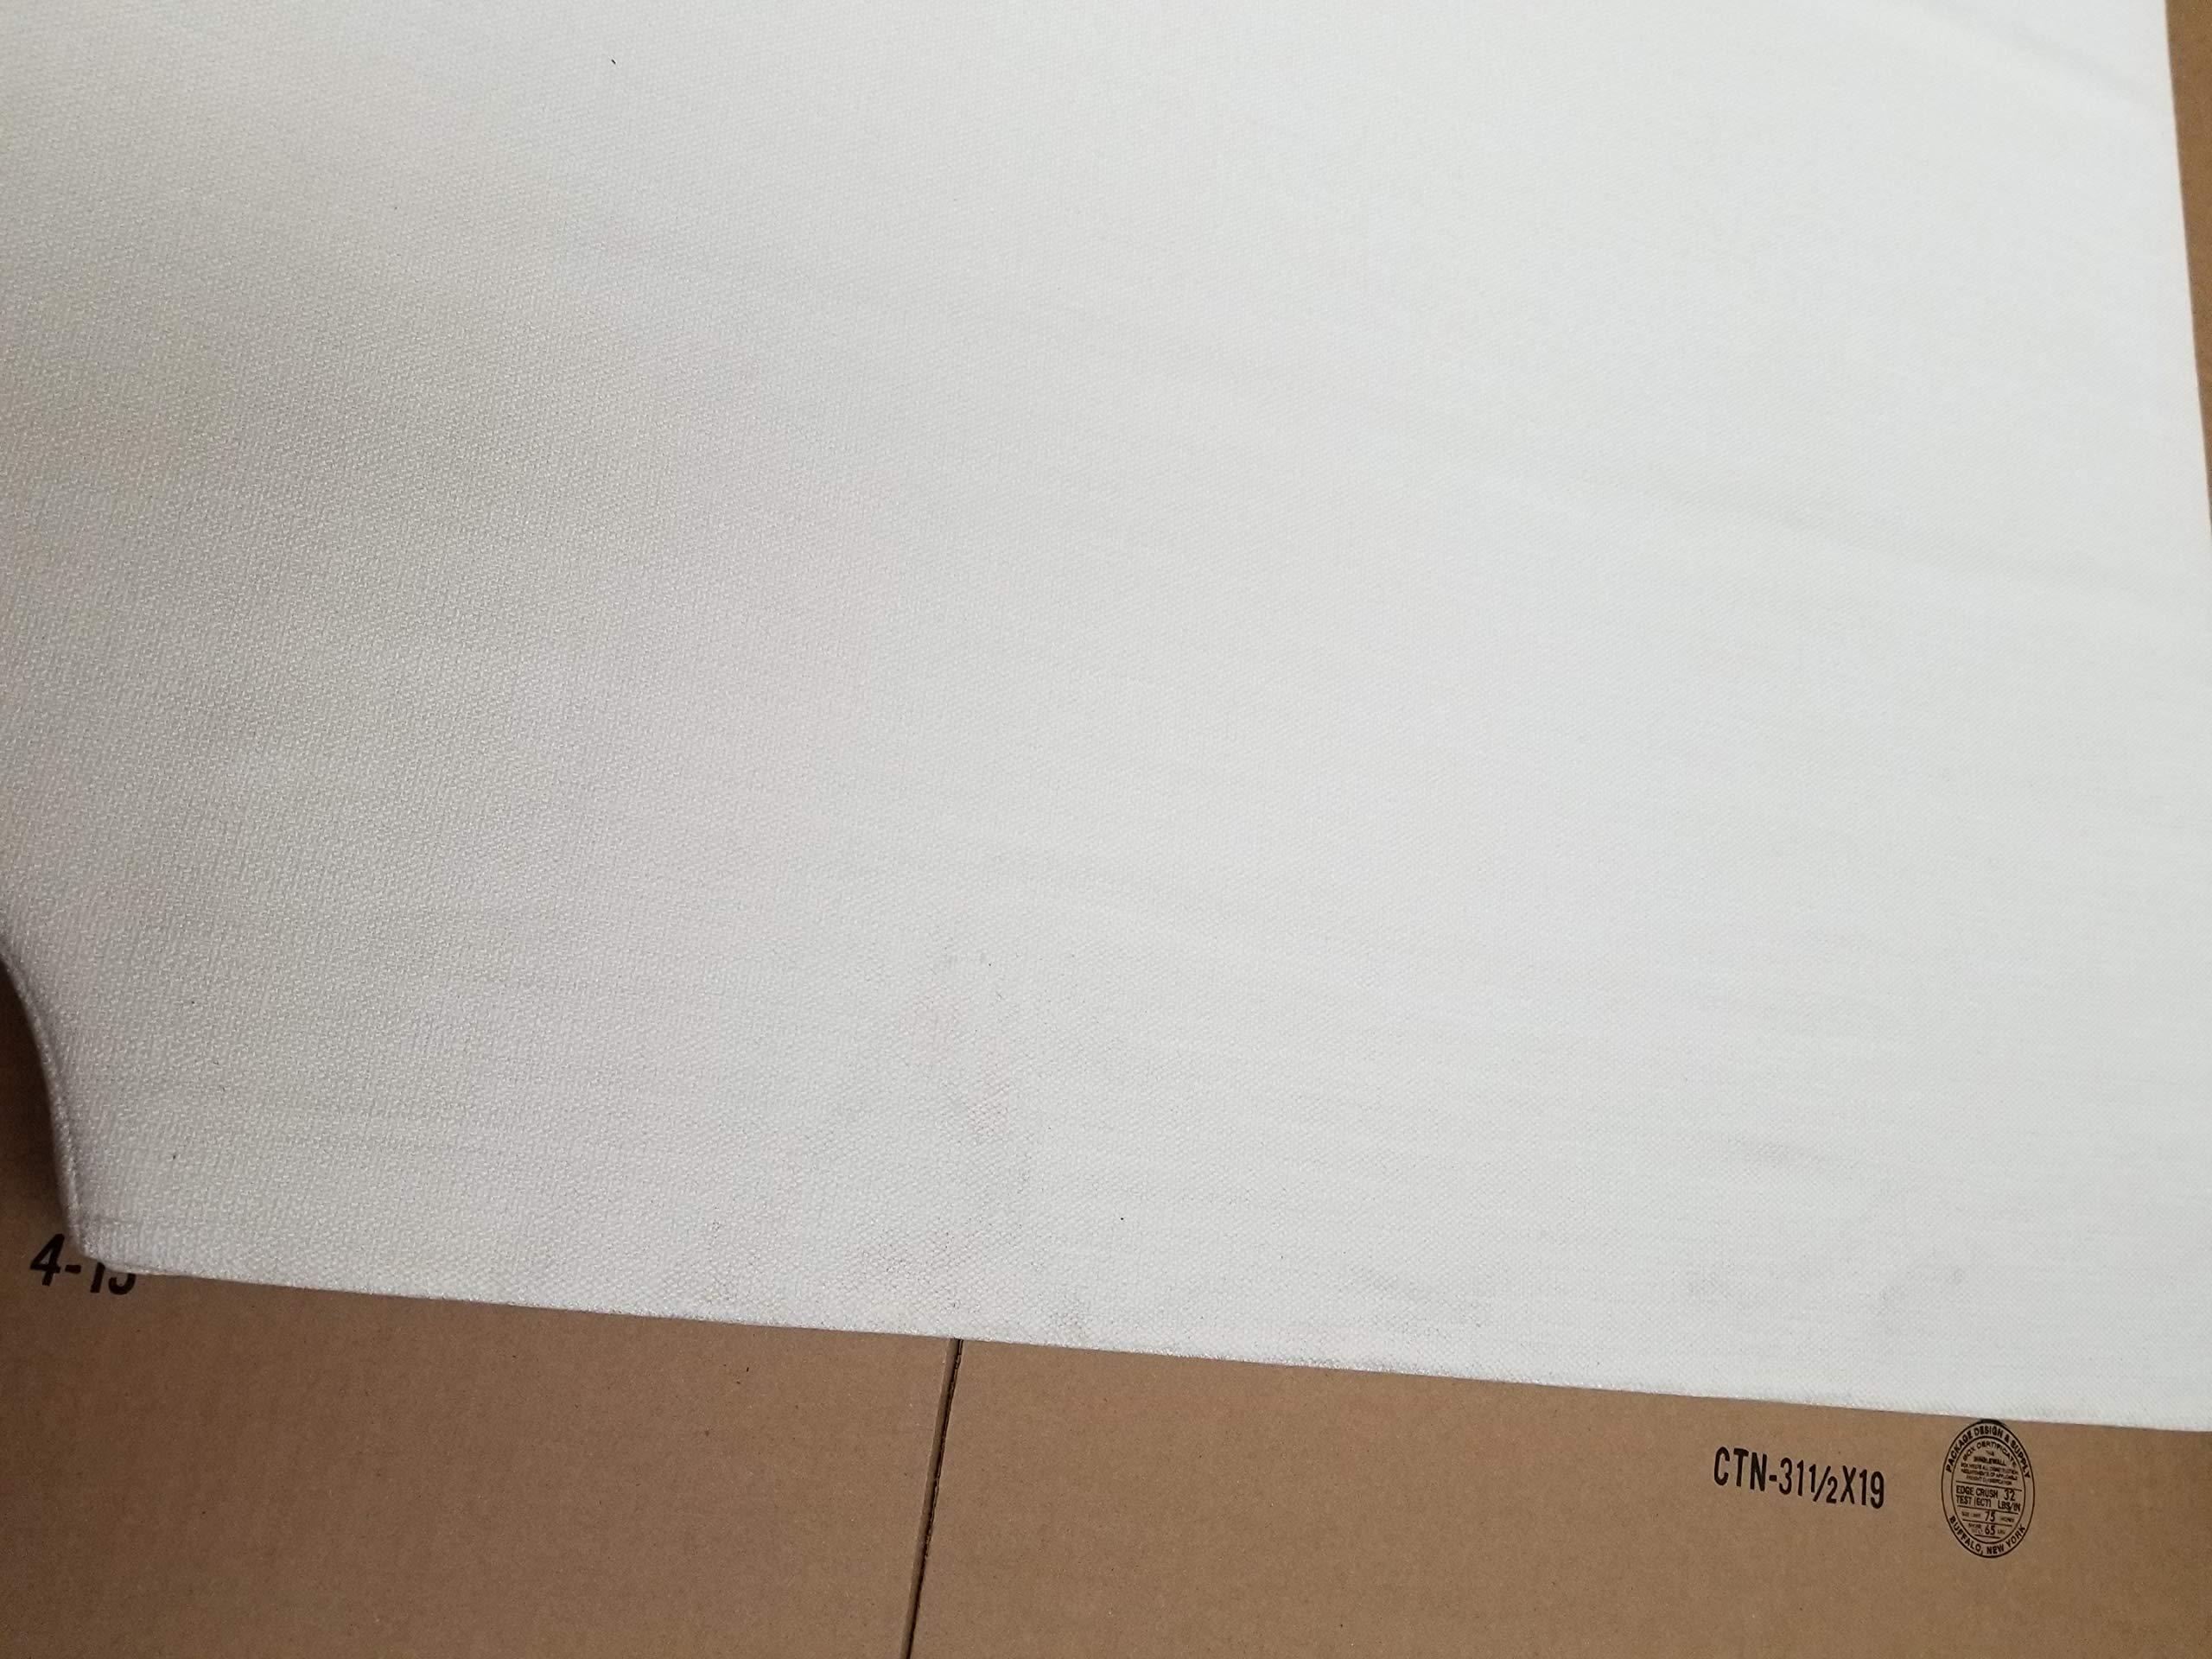 DIY Headboard - College Bedding Headboard (Dirty Edges)